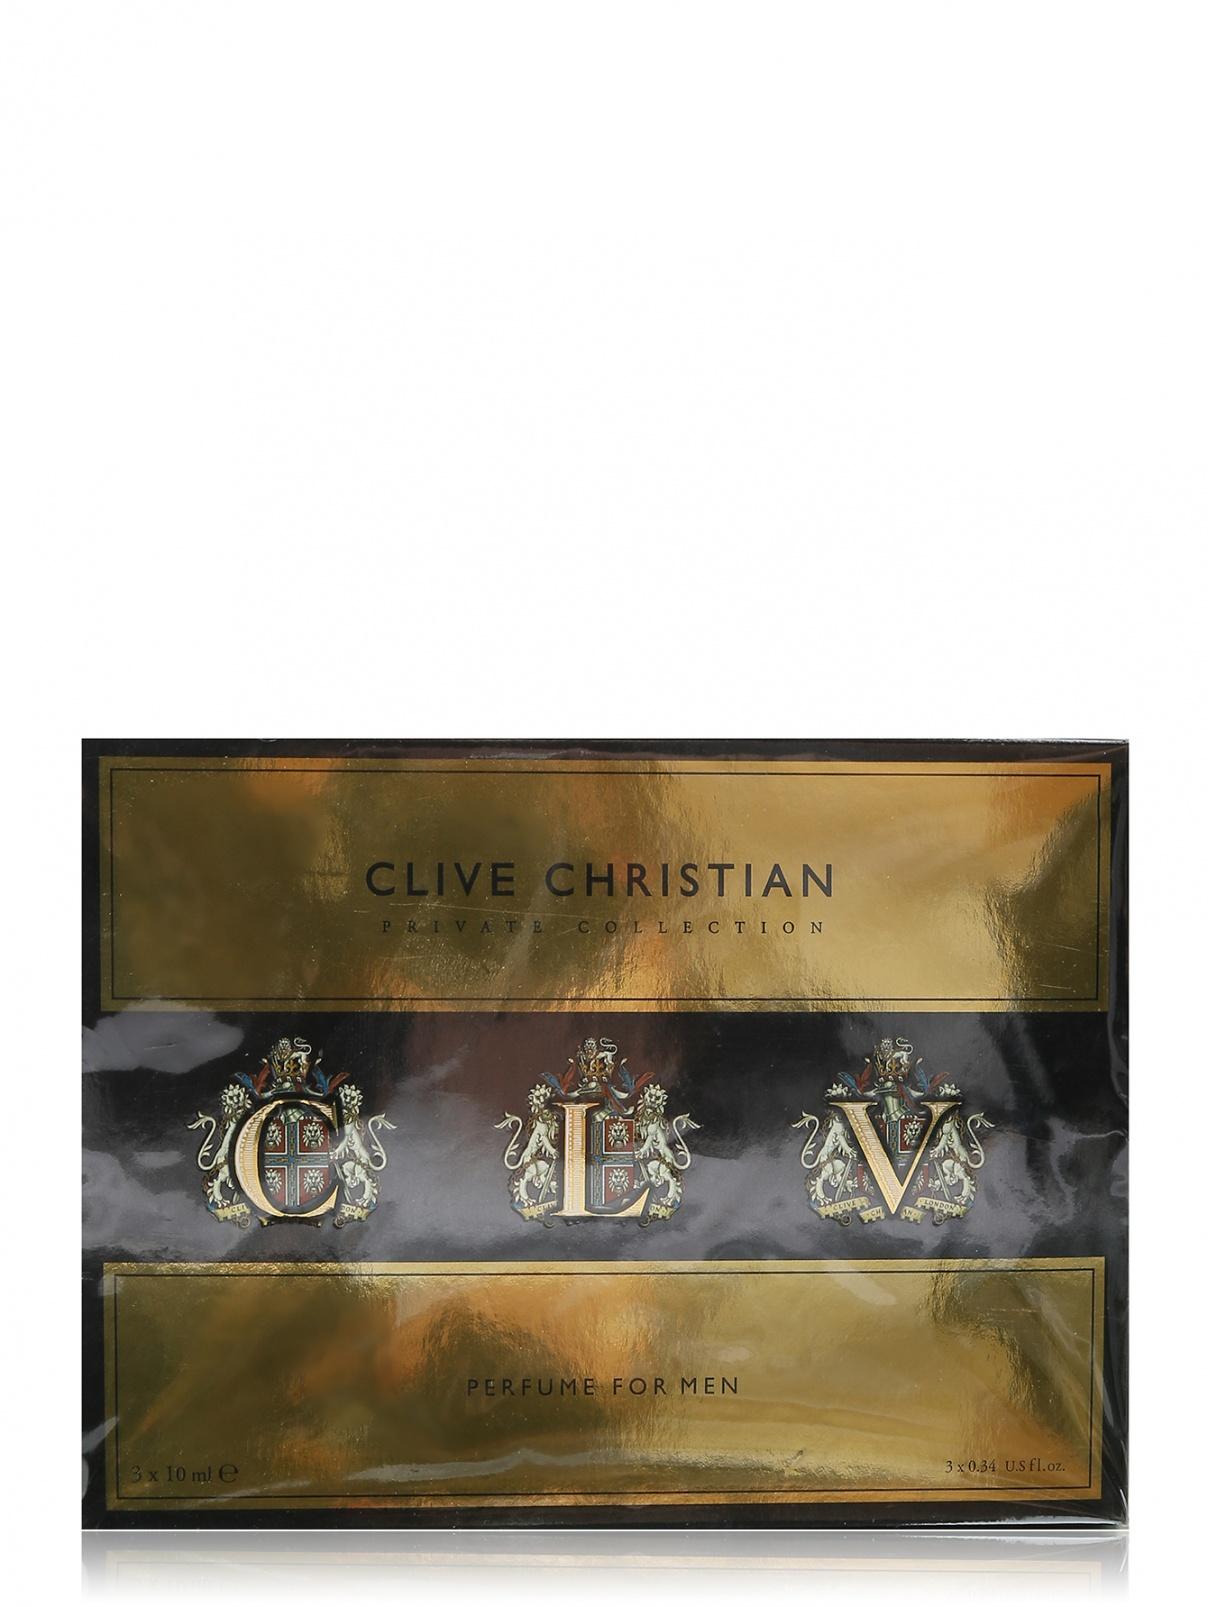 Парфюмерная вода 3x10 мл Private Collection Clive Christian  –  Общий вид